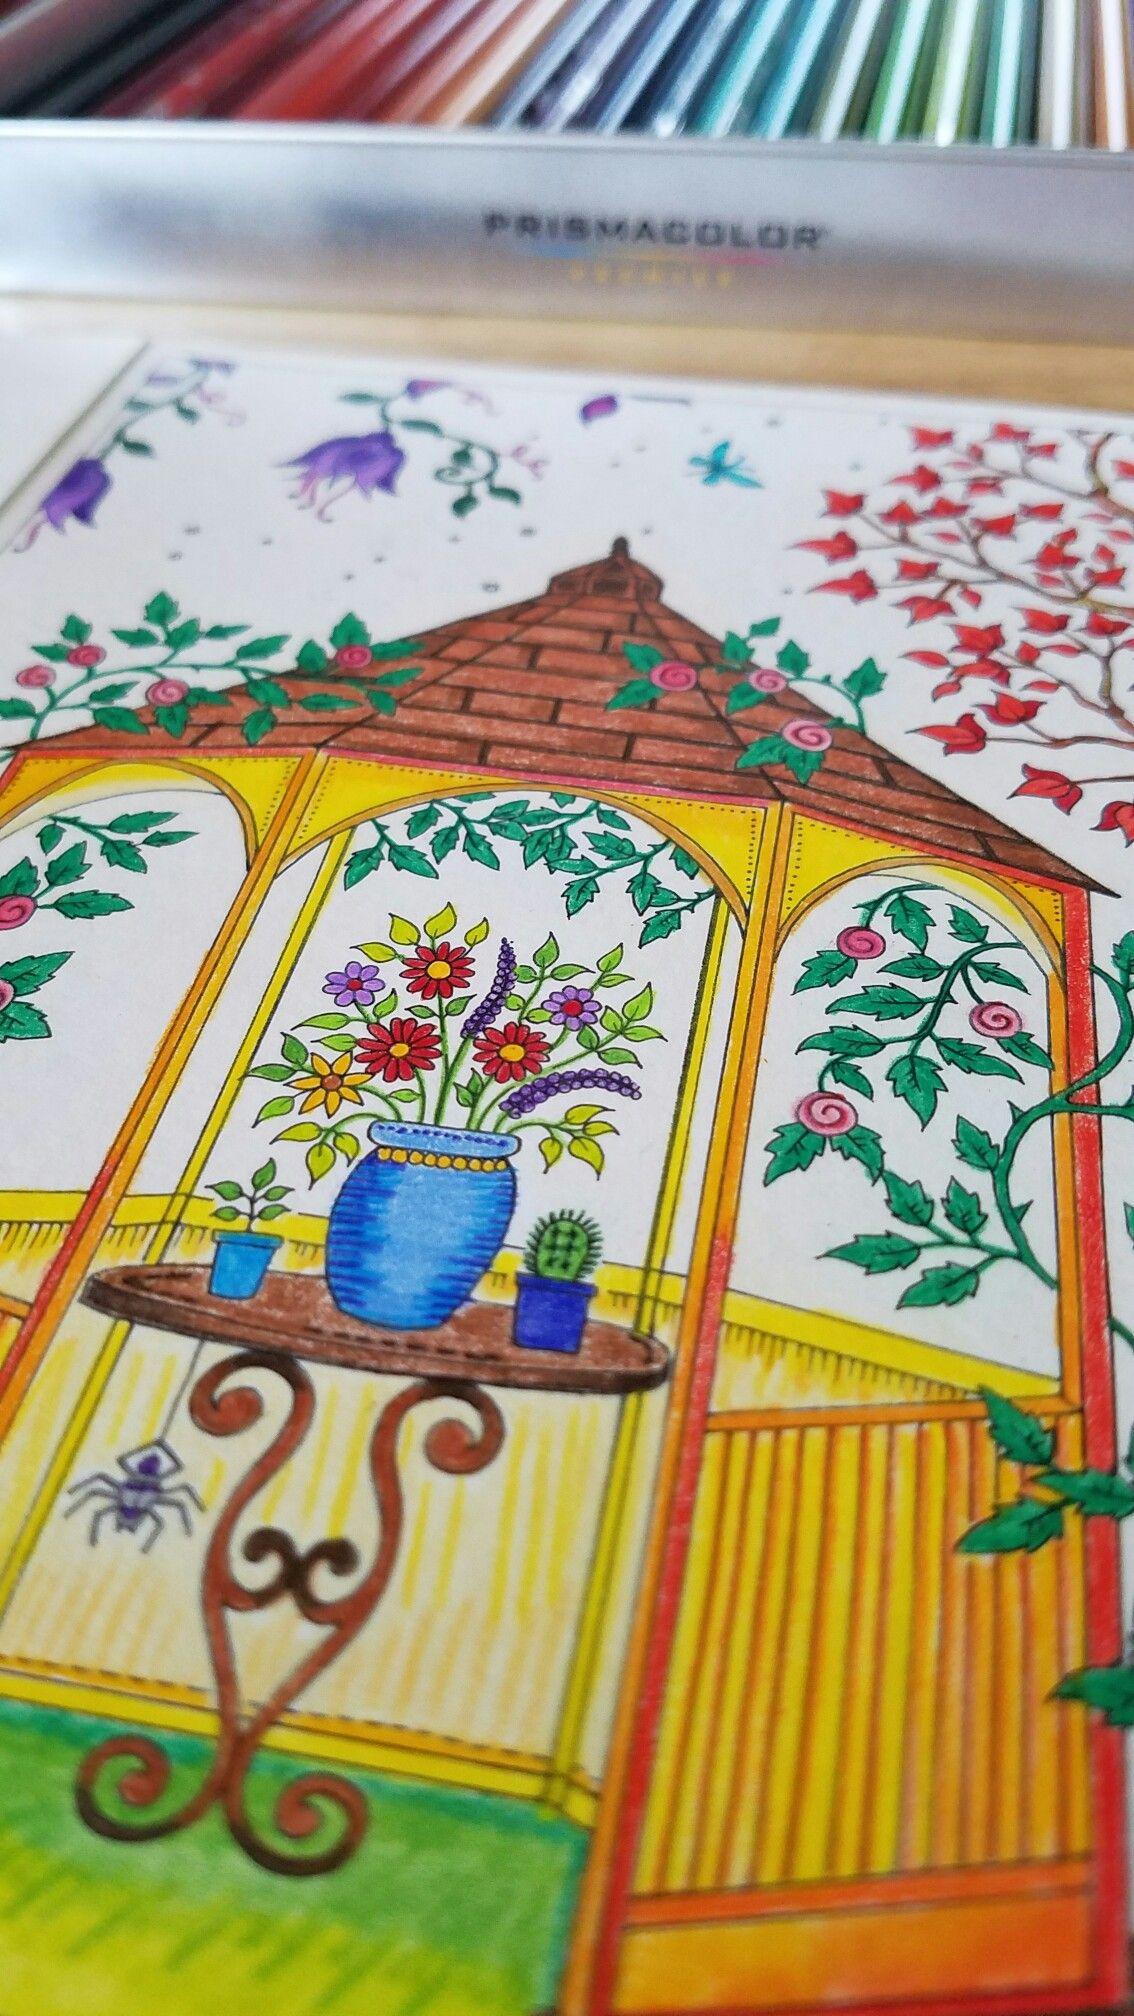 Johanna Basford Secret Garden Postcard GardenWatercolor PencilsSecret GardensColoring BooksZentangleMarkers PostcardsDoodles